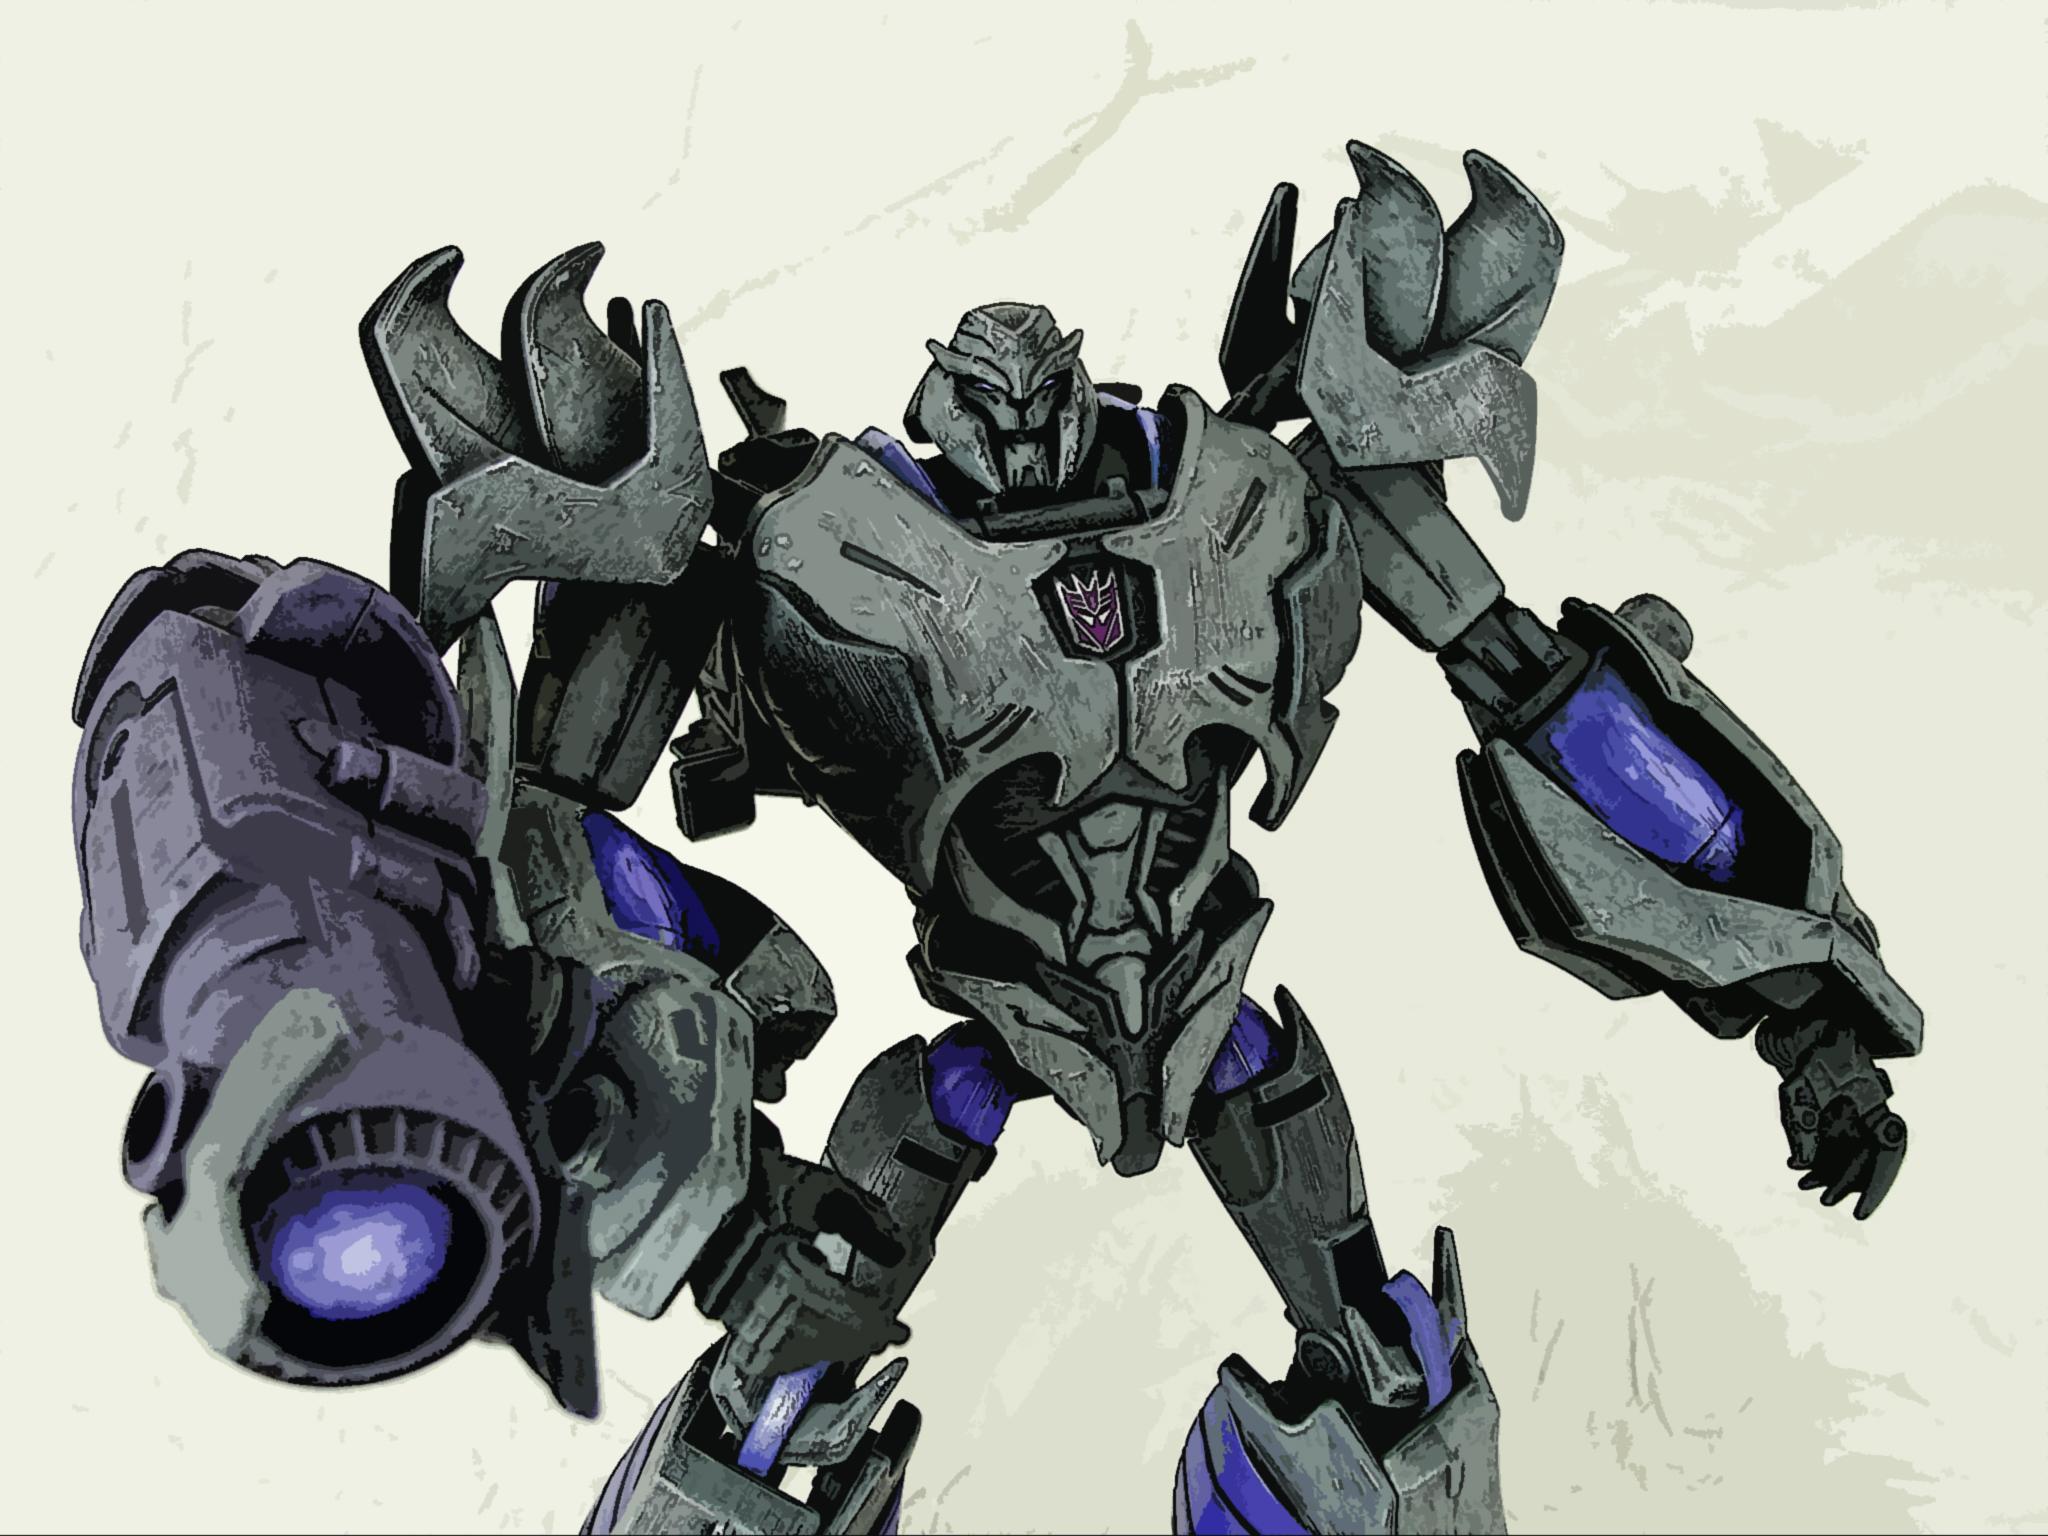 73 transformers prime megatron wallpaper on wallpapersafari - Transformers prime megatron ...